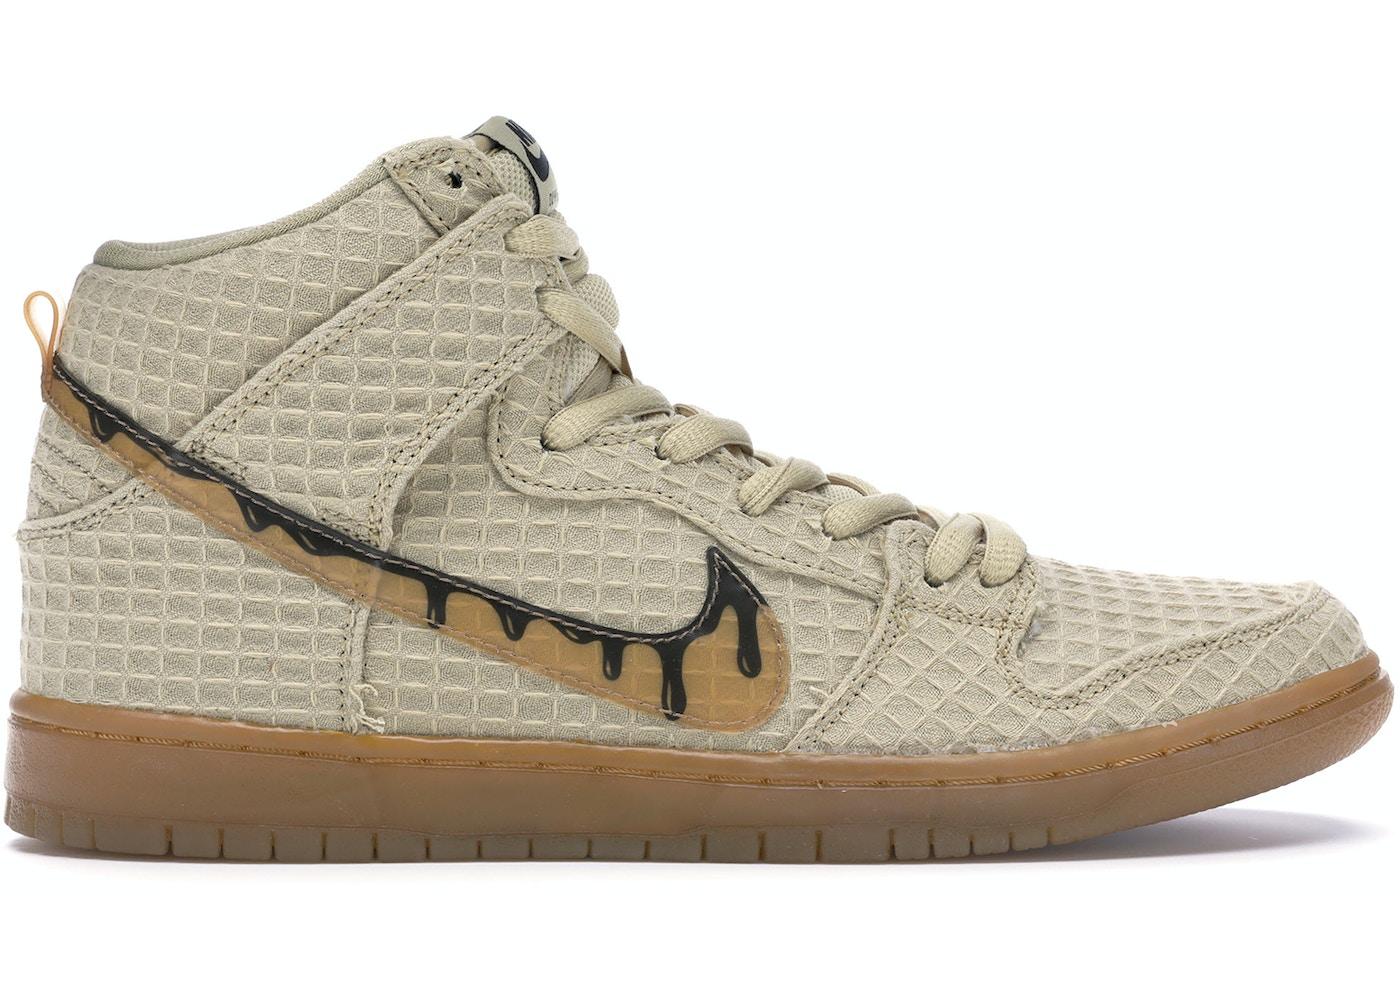 7c8bf543 Nike Dunk SB High Waffle